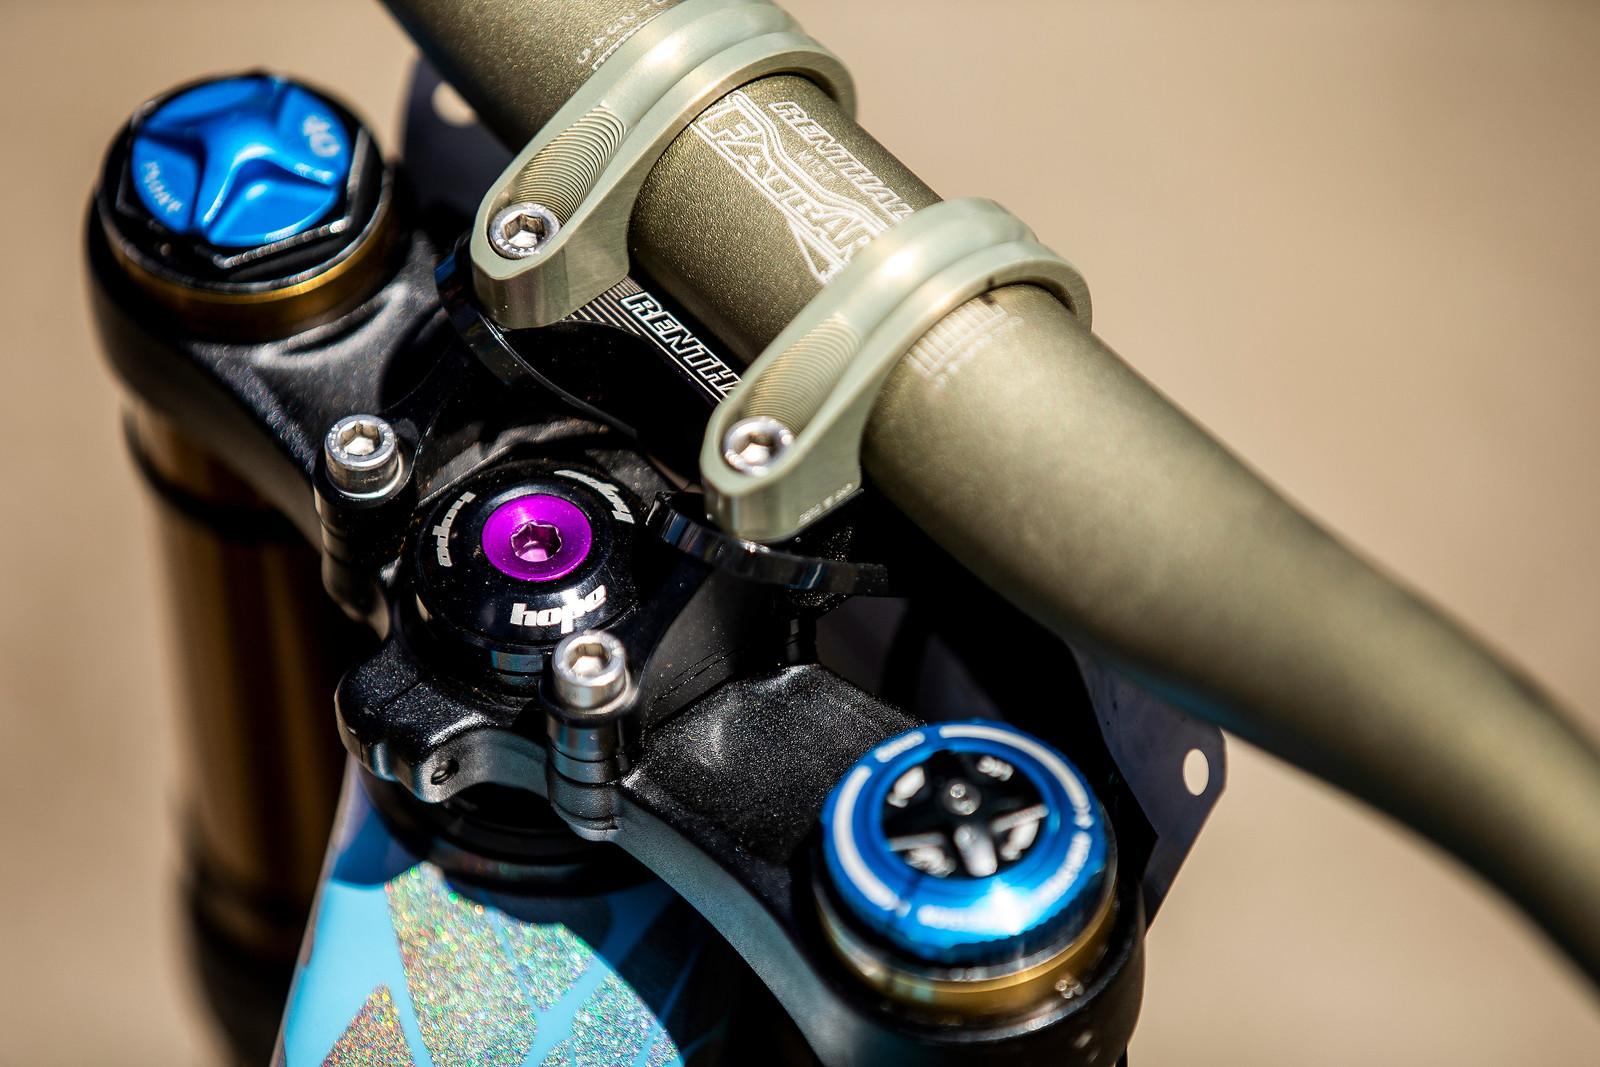 Purple Ano Accents - WINNING BIKE - Rachel Atherton's Trek Session - Mountain Biking Pictures - Vital MTB